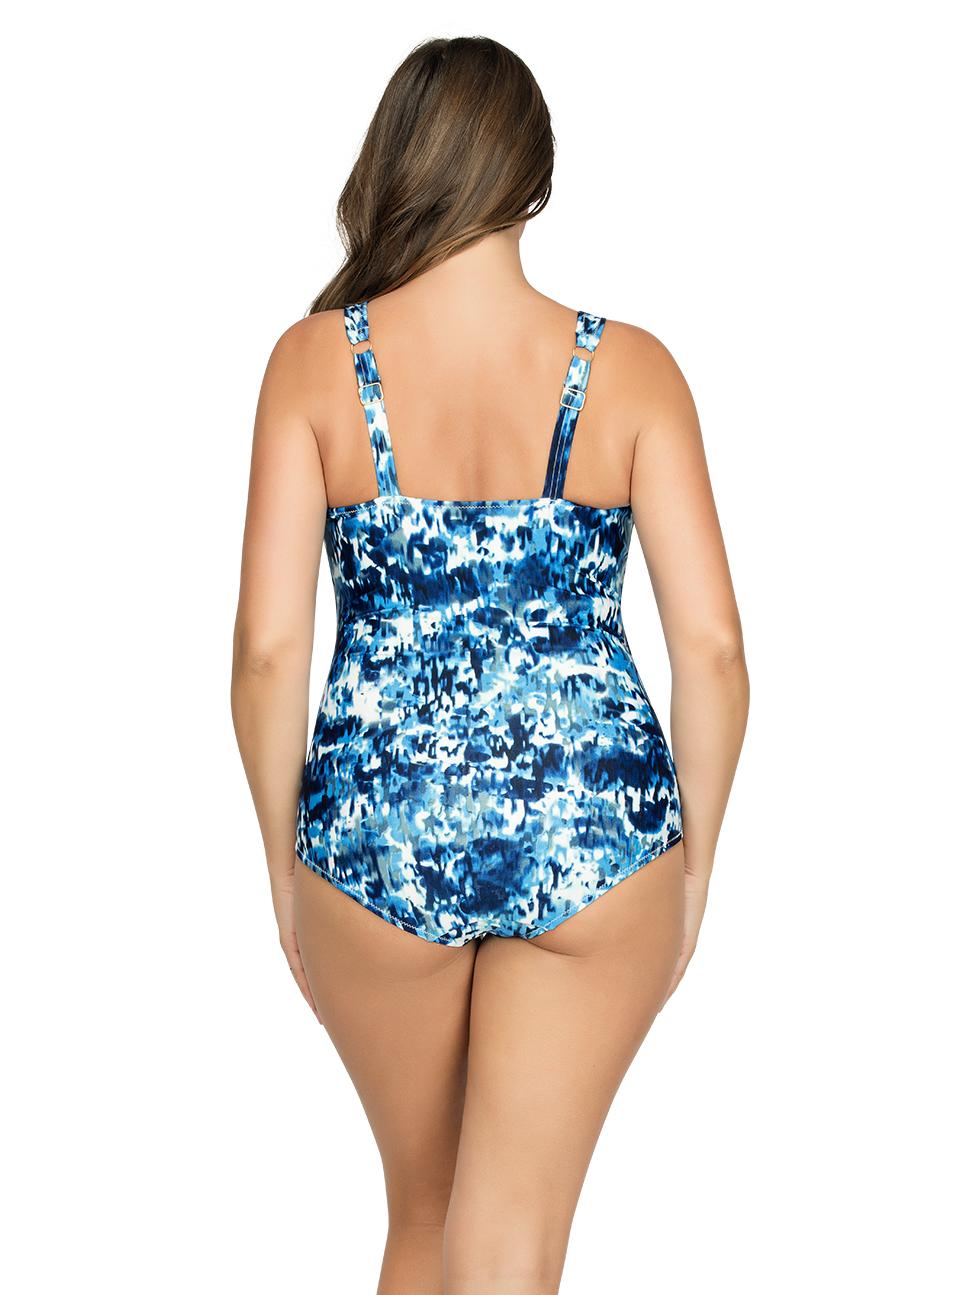 PARFAIT Oceane OnePieceSwimsuitS8066 SplashPrint Back - Oceane One-Piece Swimsuit Splash Print S8066